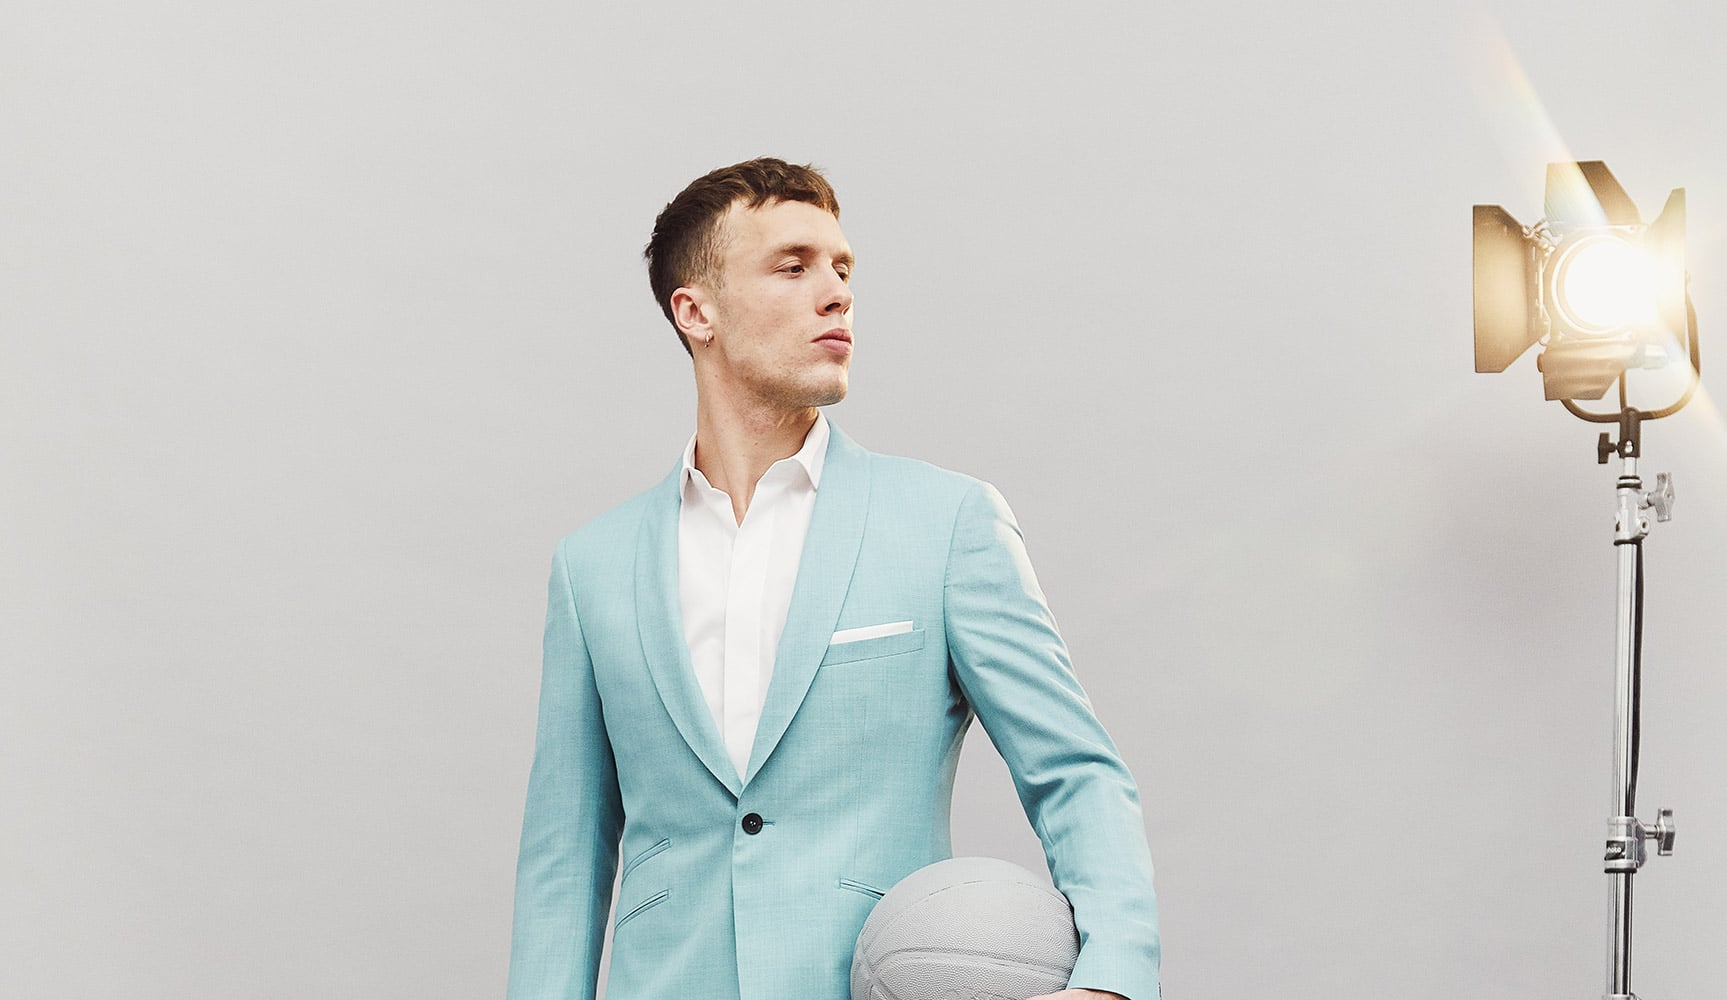 paolo-costume-sur-mesure-toile-nattee-bleu-turquoise3-_bd2